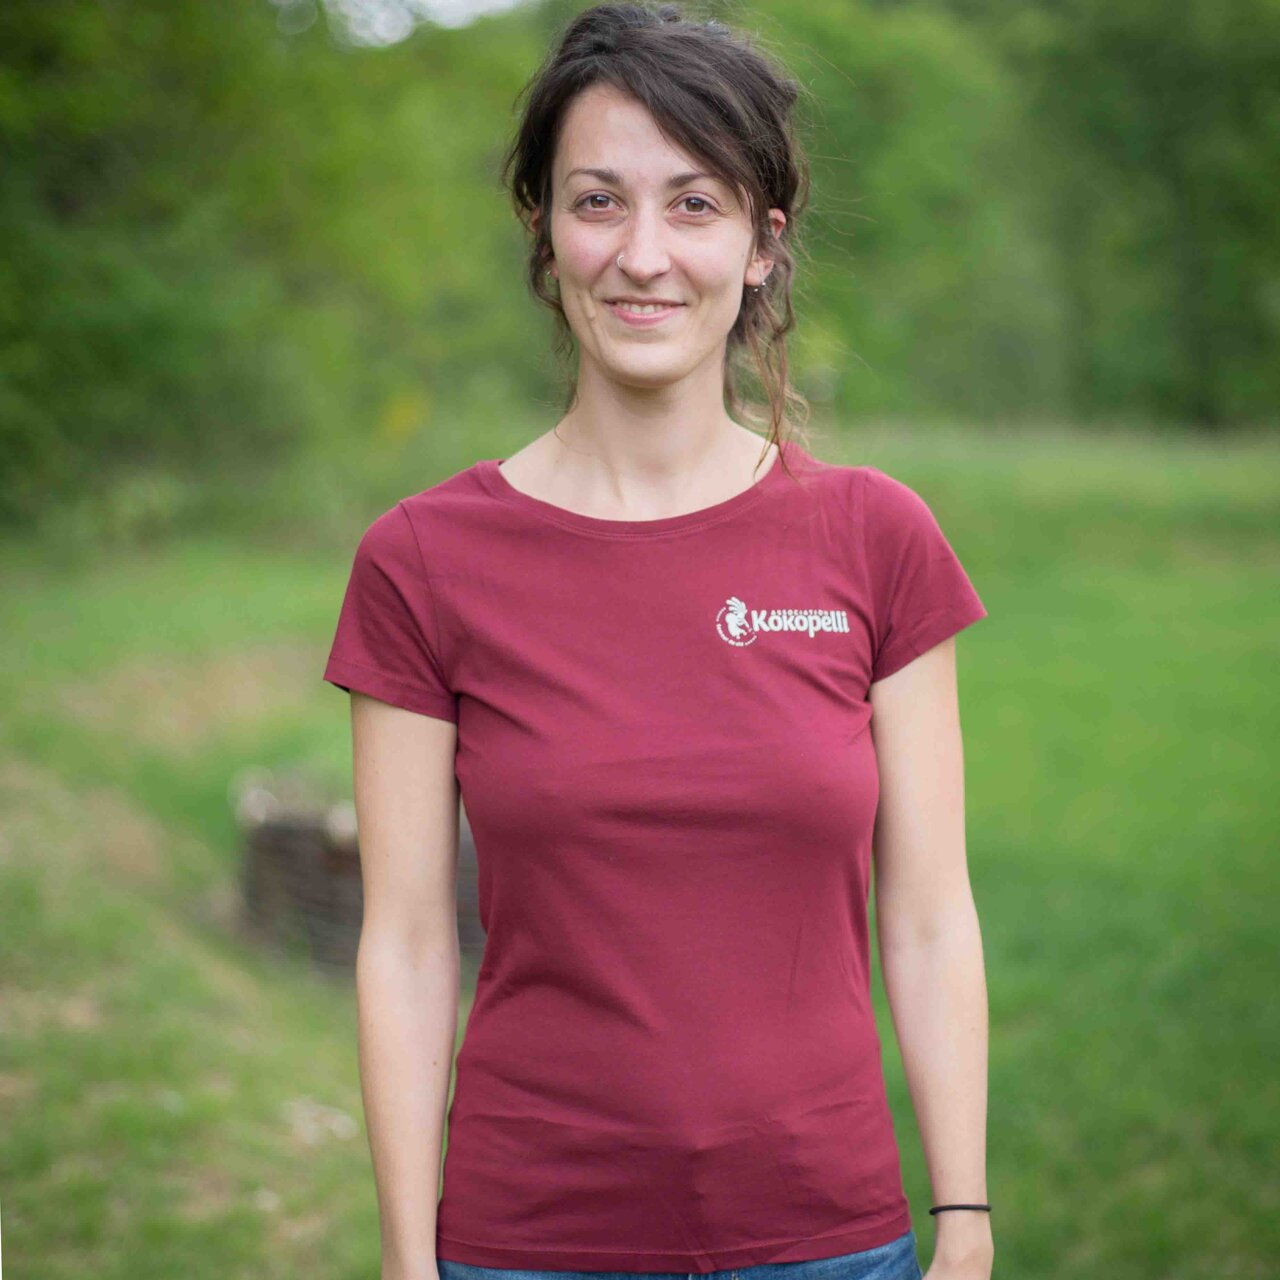 Vêtements - T-Shirt femme burgundy, taille XS